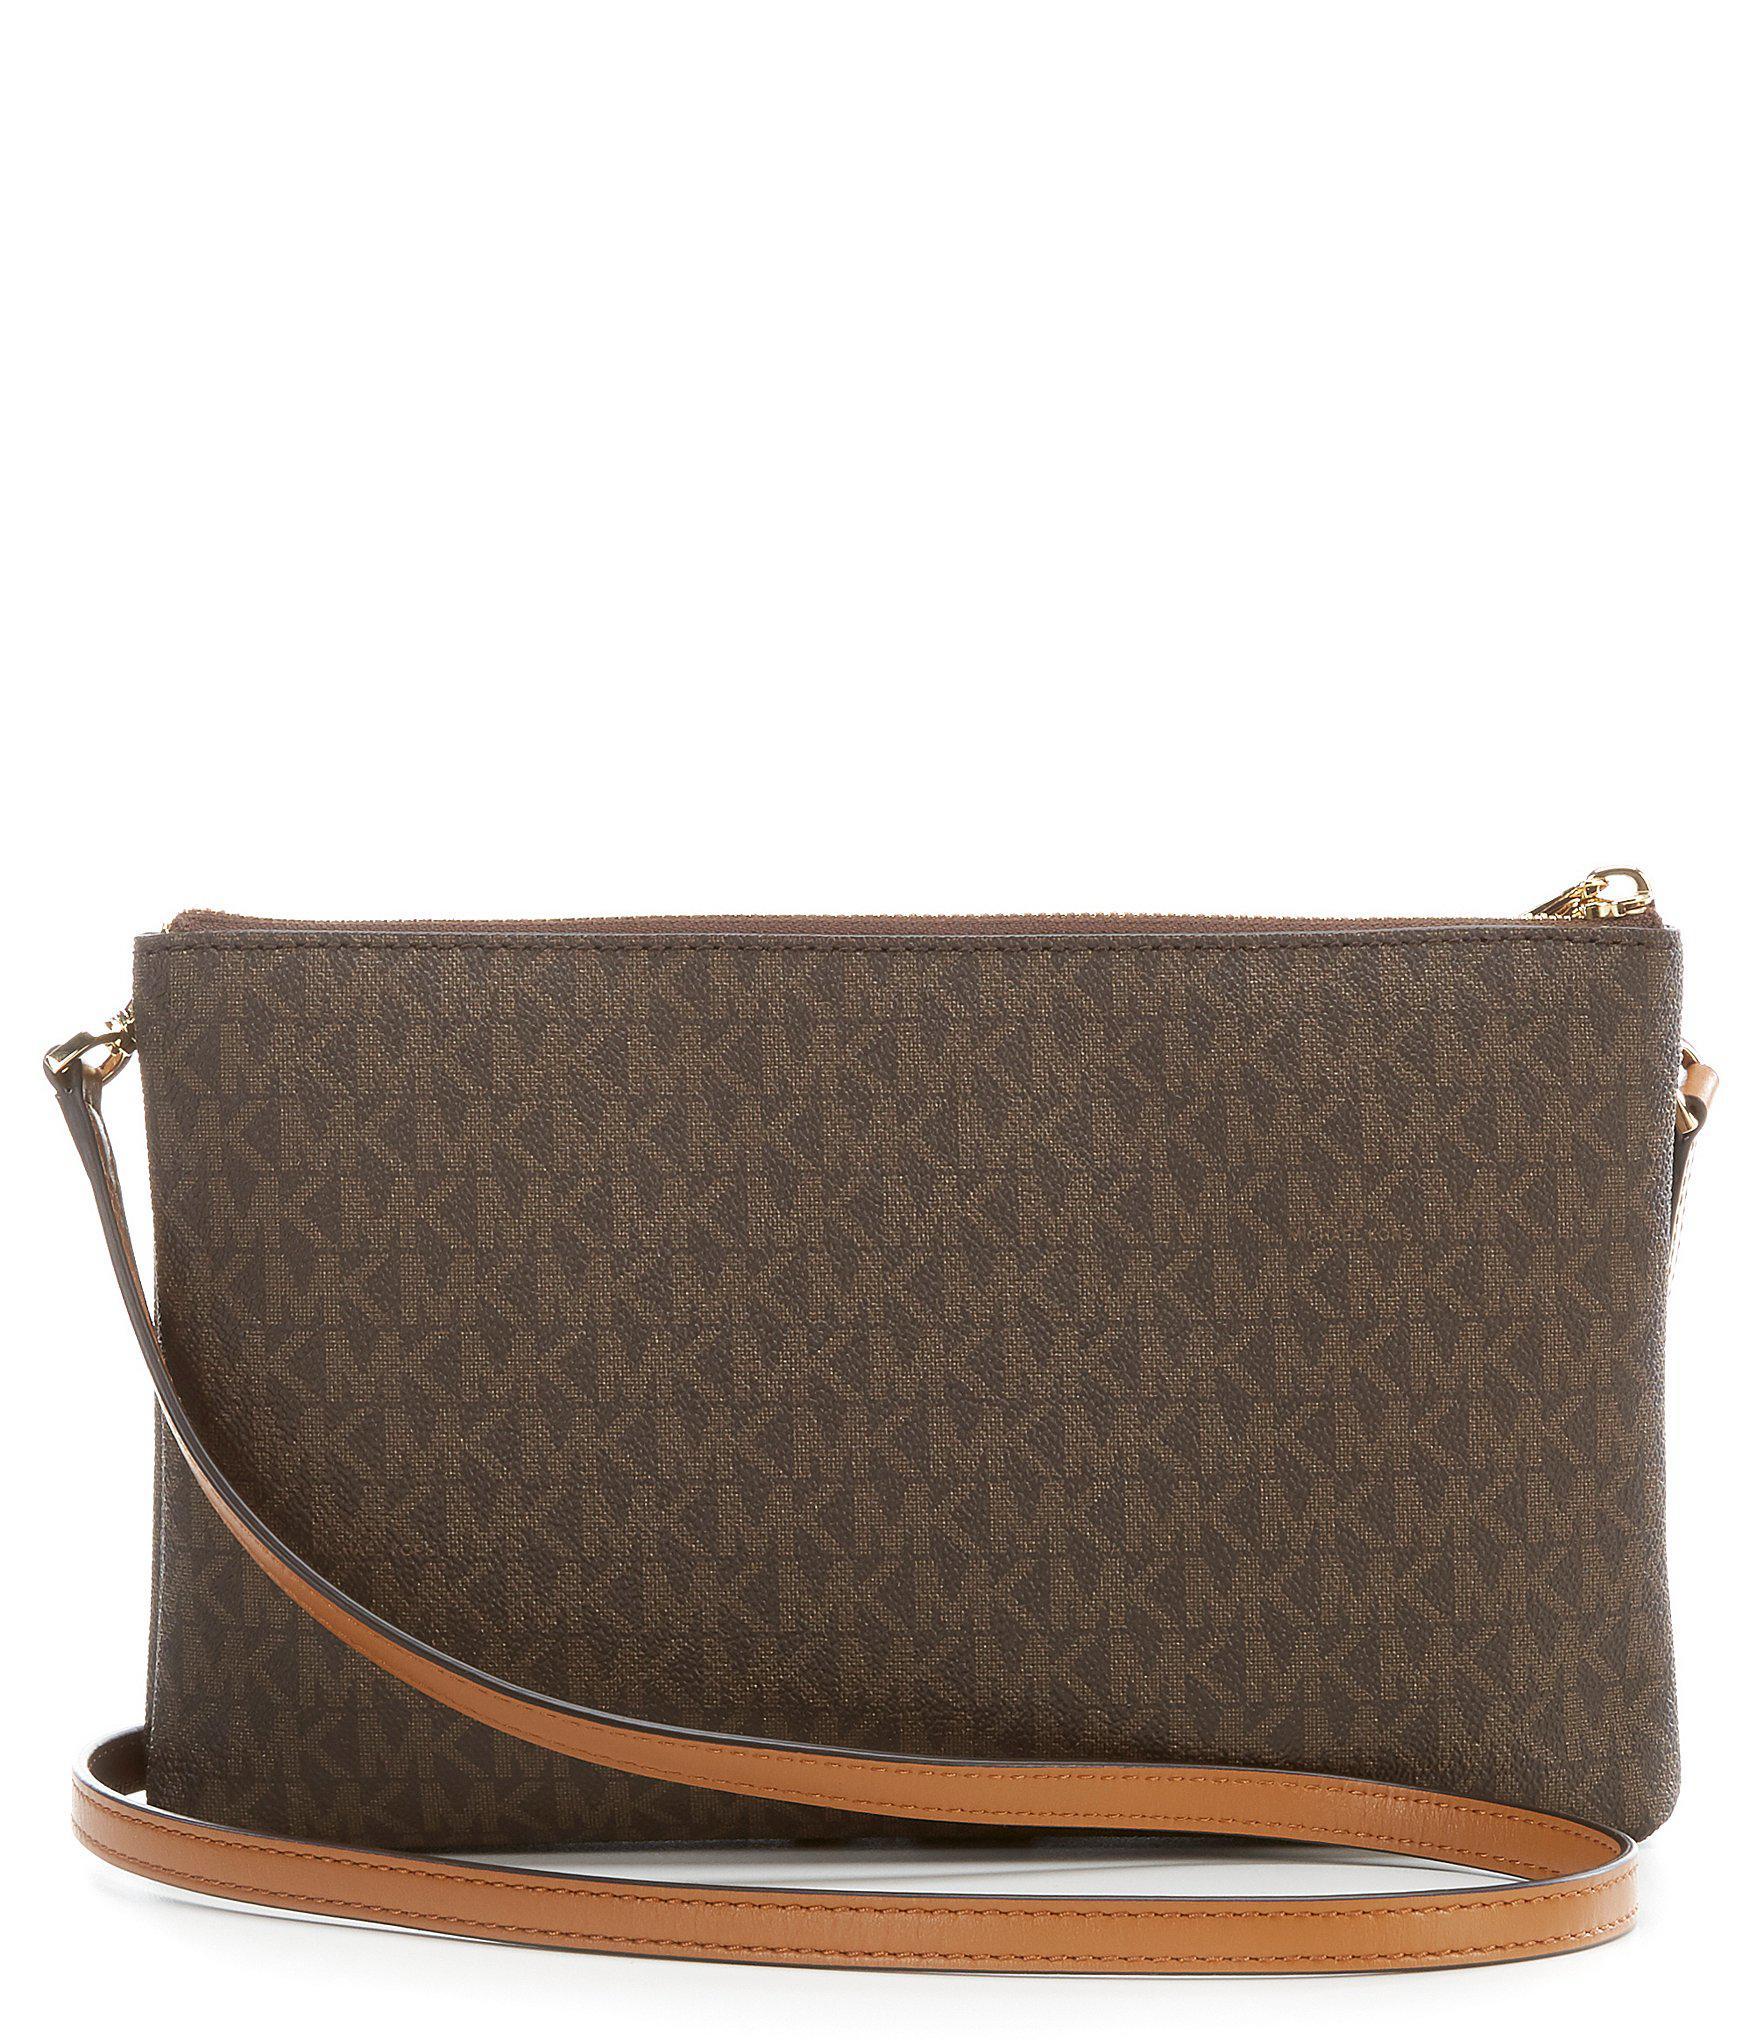 1c336f6e05c7 Lyst - MICHAEL Michael Kors Adele Double-zip Cross-body Bag in Brown